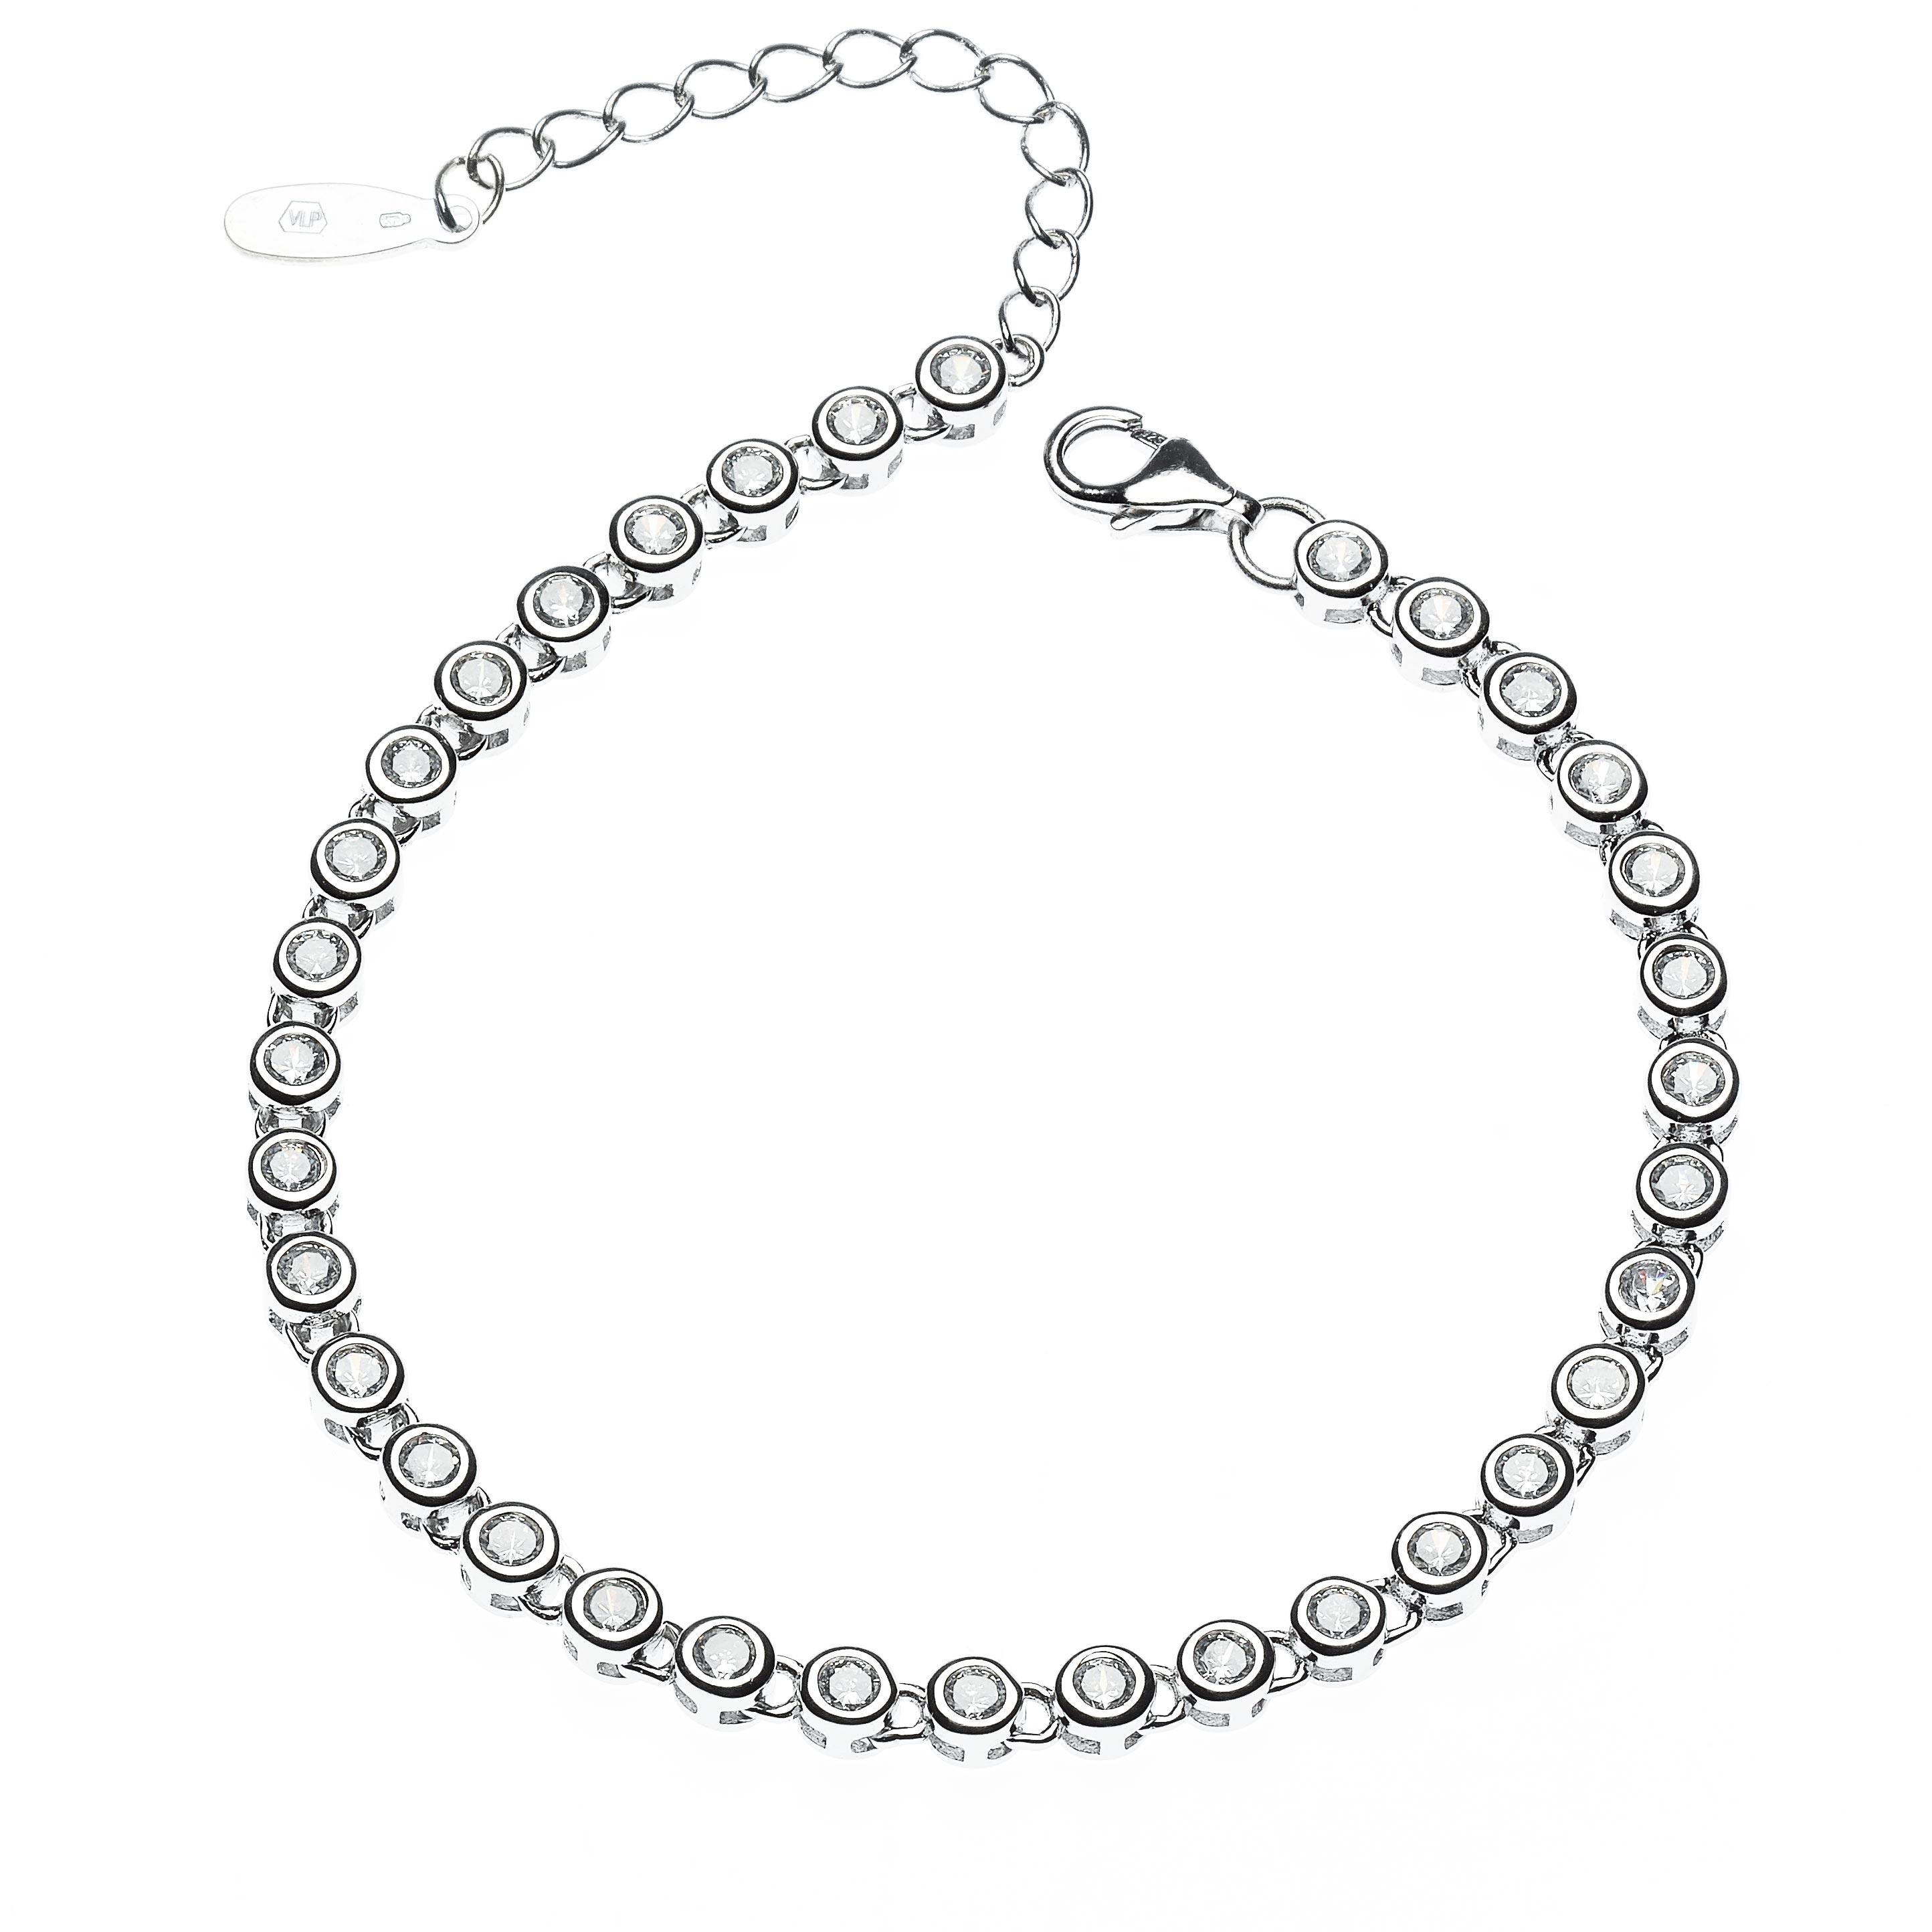 Dámský stříbrný náramek NB-1039